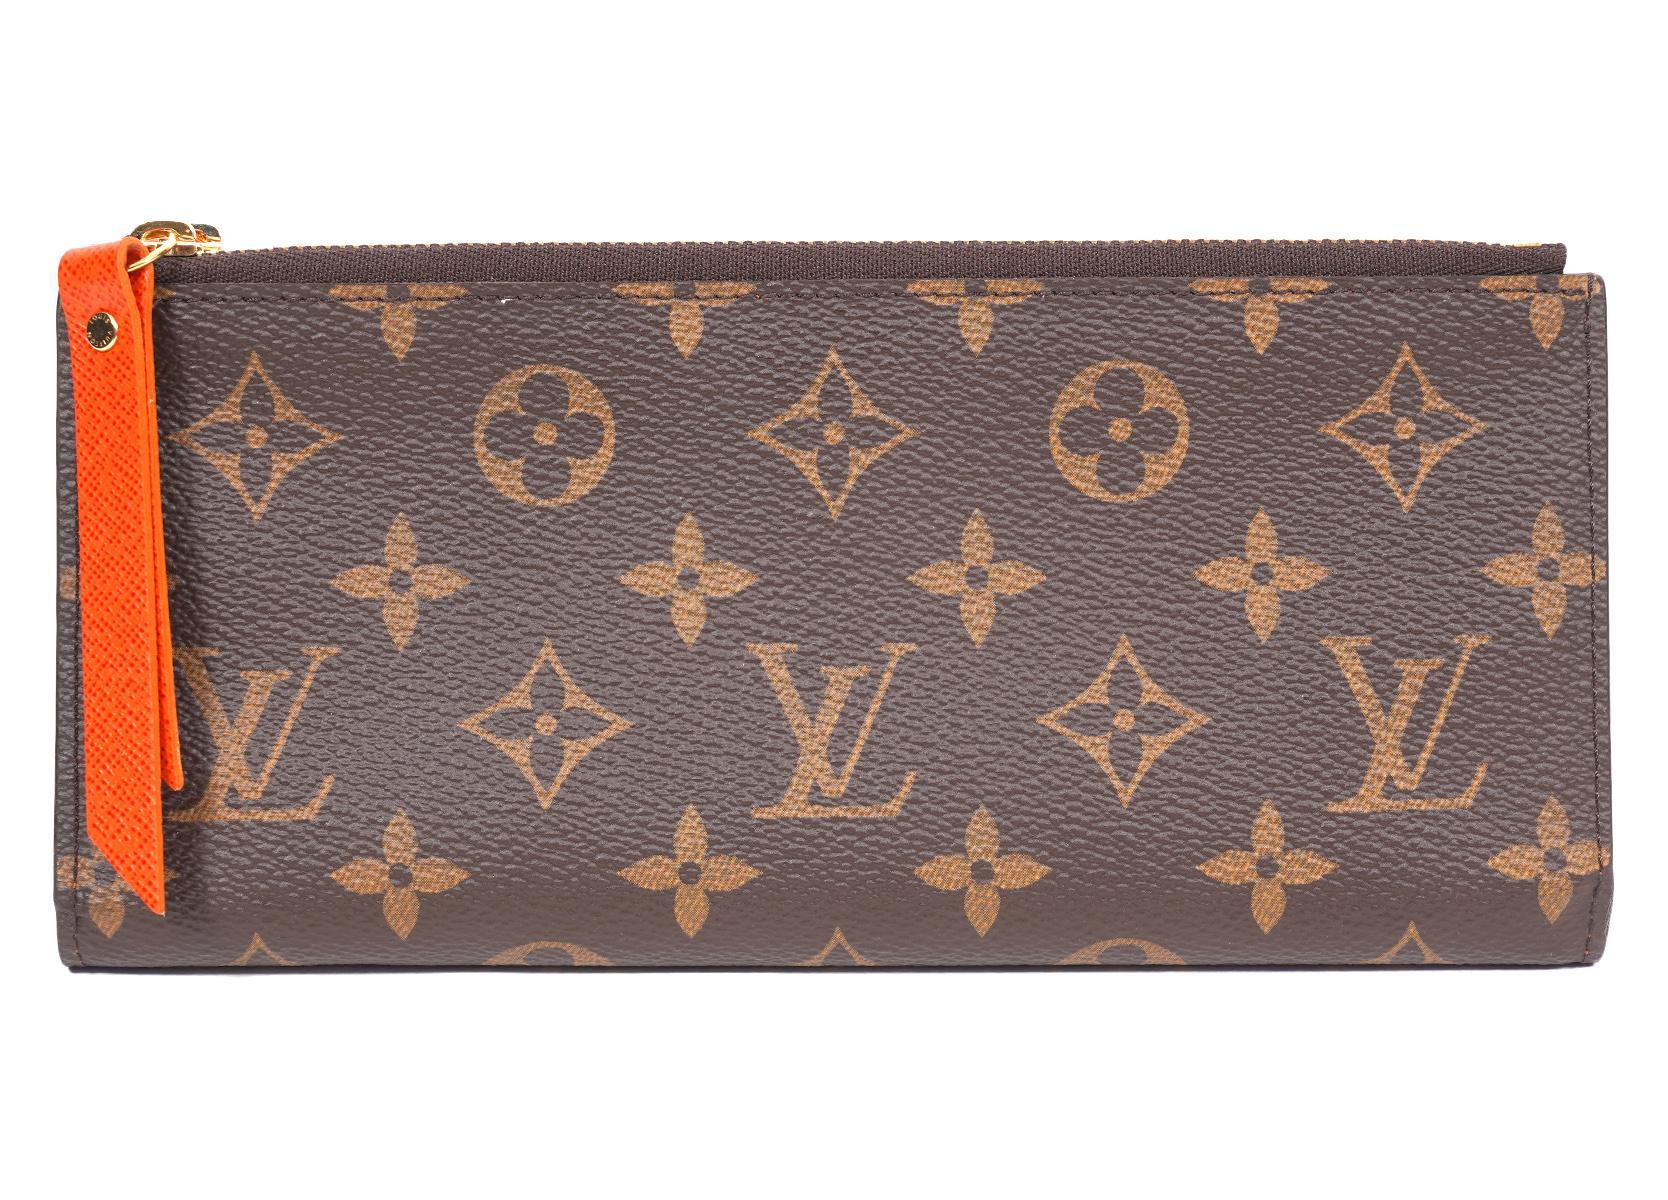 Louis Vuitton Monogram Adele Wallet